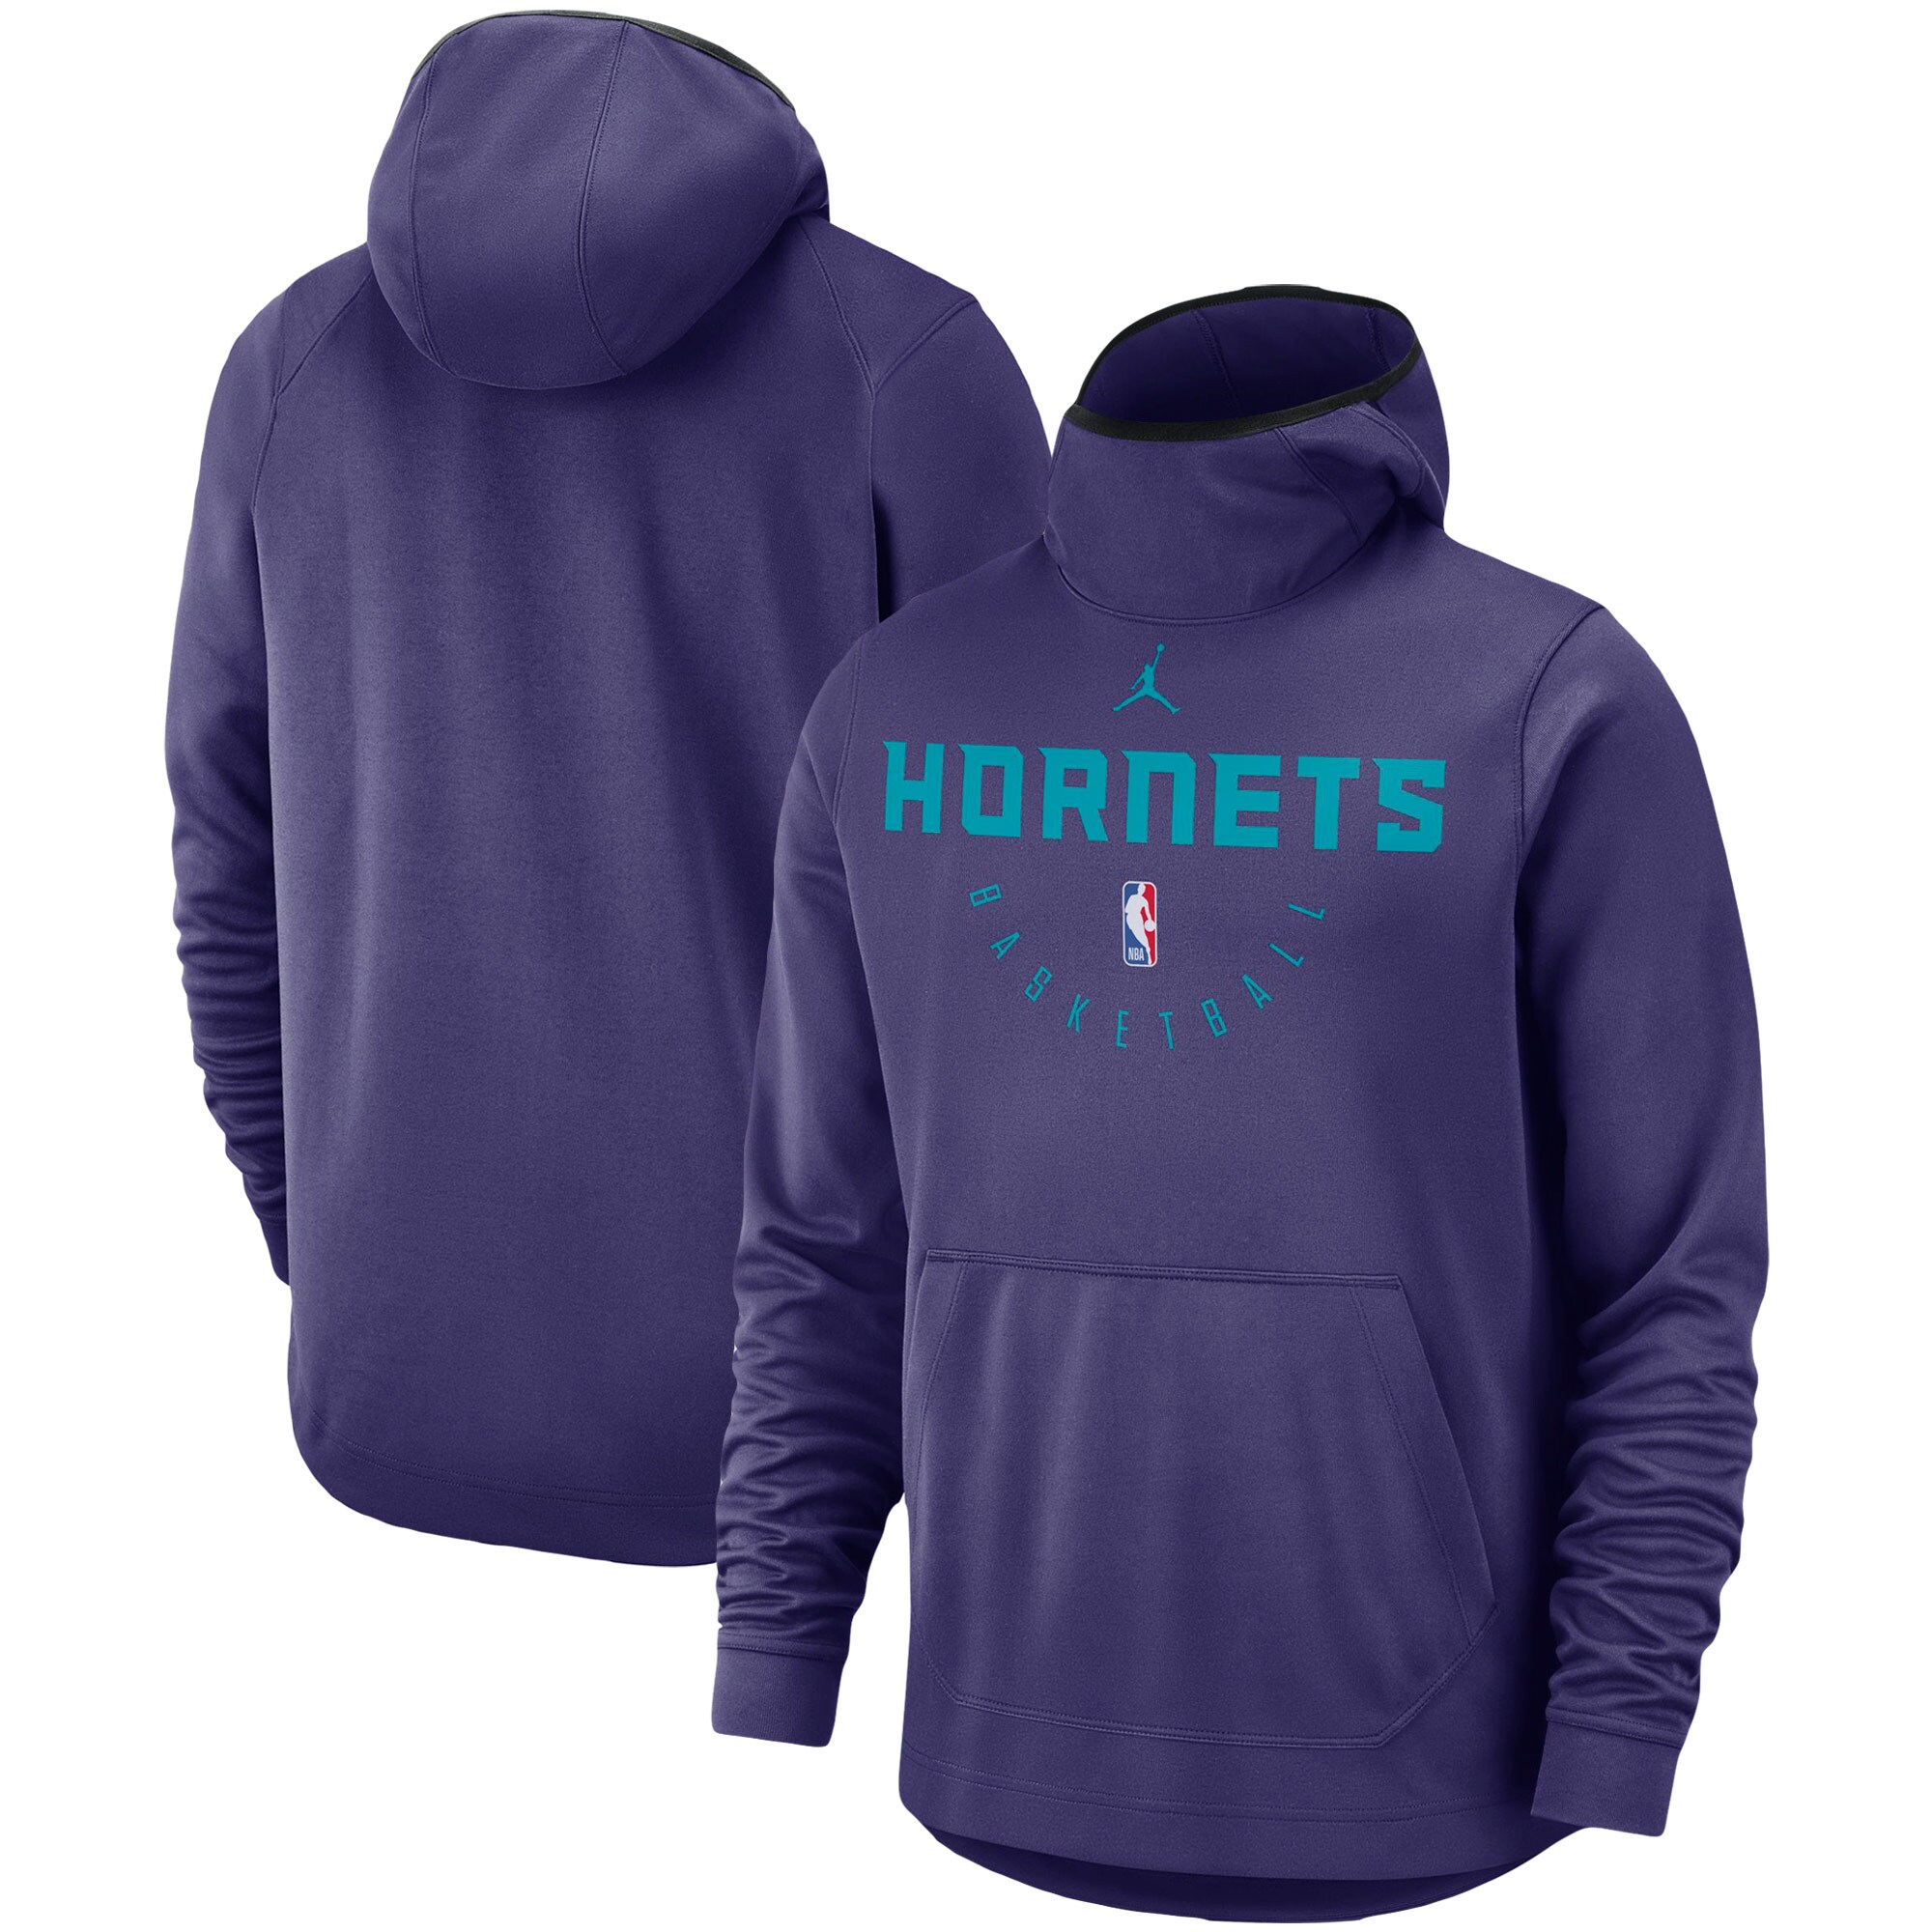 Charlotte Hornets Jordan Brand Spotlight Performance Pullover Hoodie - Purple